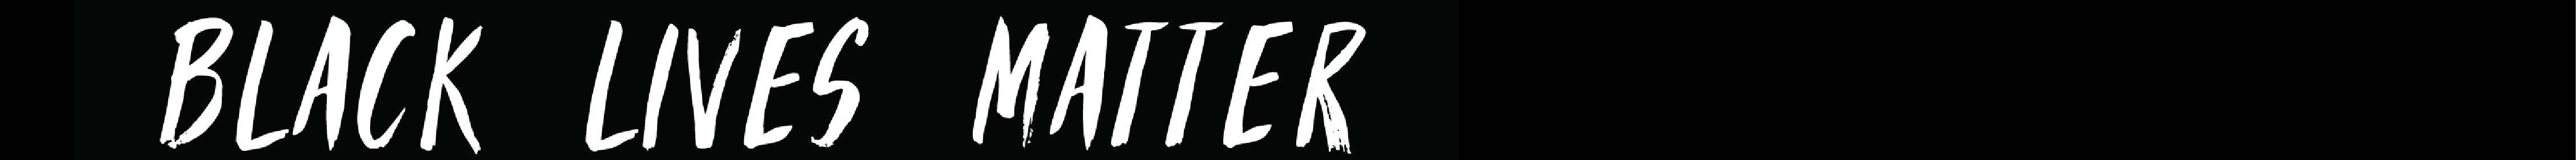 <p>Black Lives Matter narrow web banner</p>